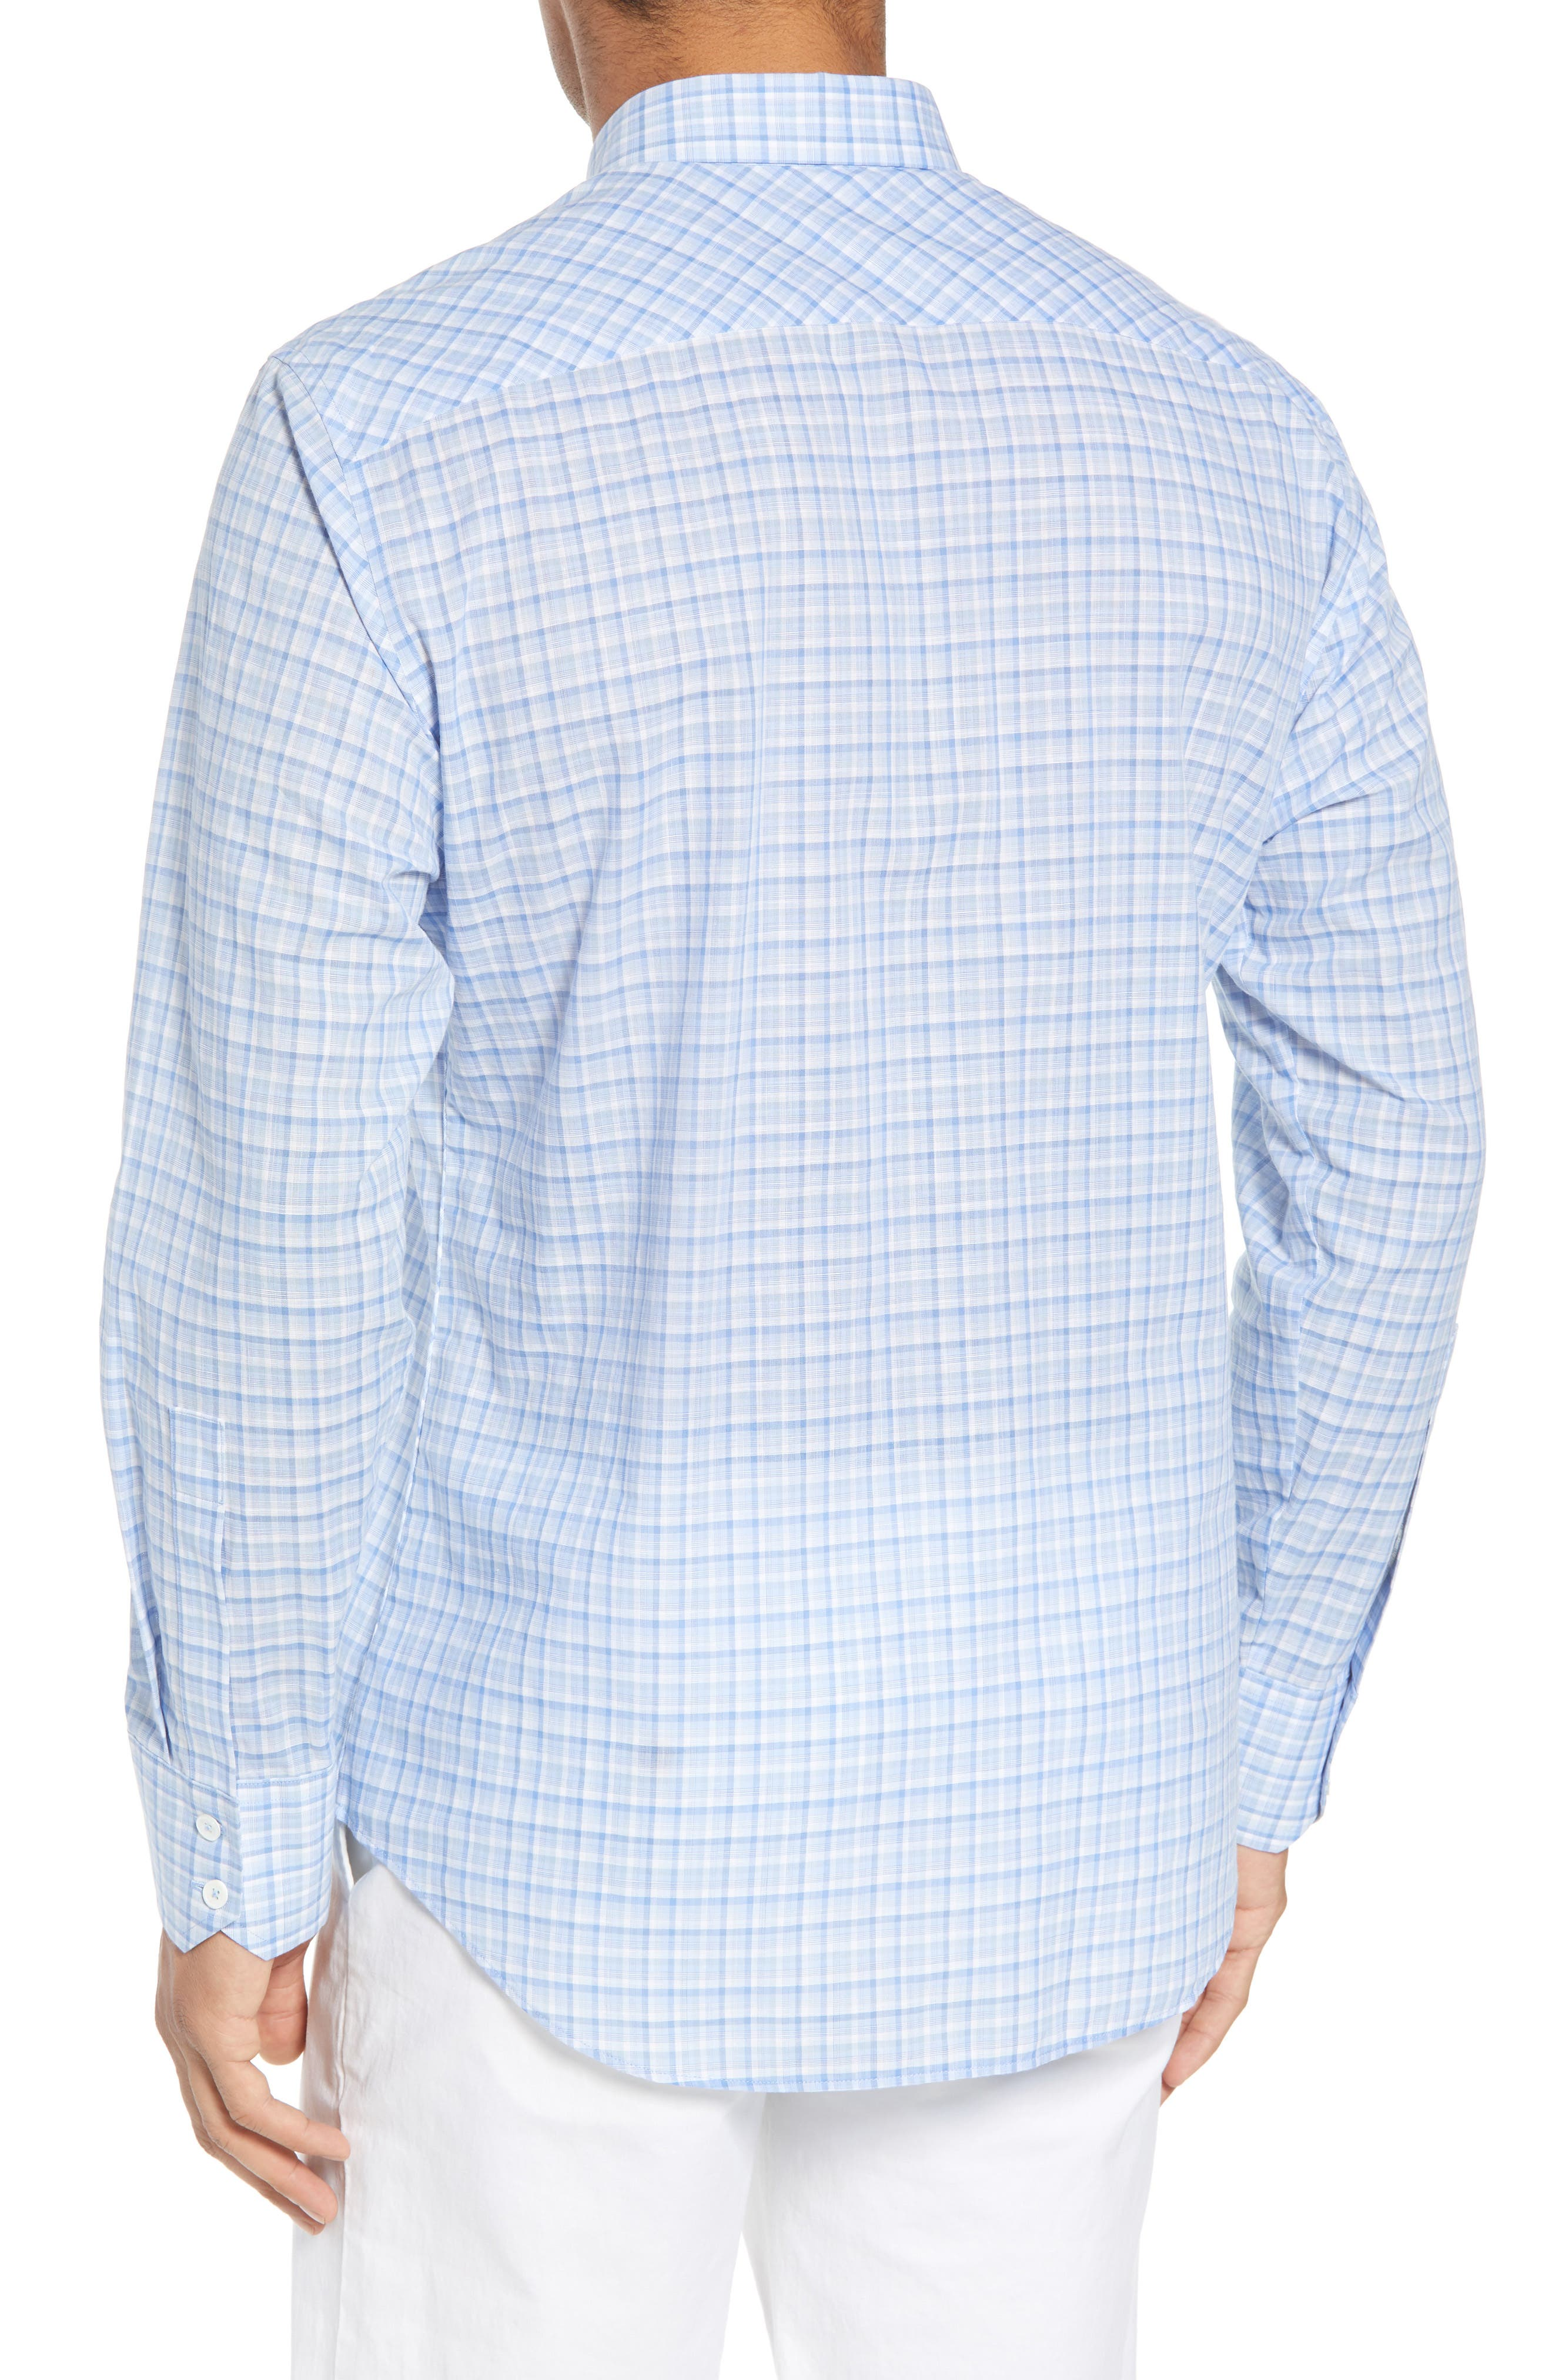 Jian Regular Fit Sport Shirt,                             Alternate thumbnail 2, color,                             Sky